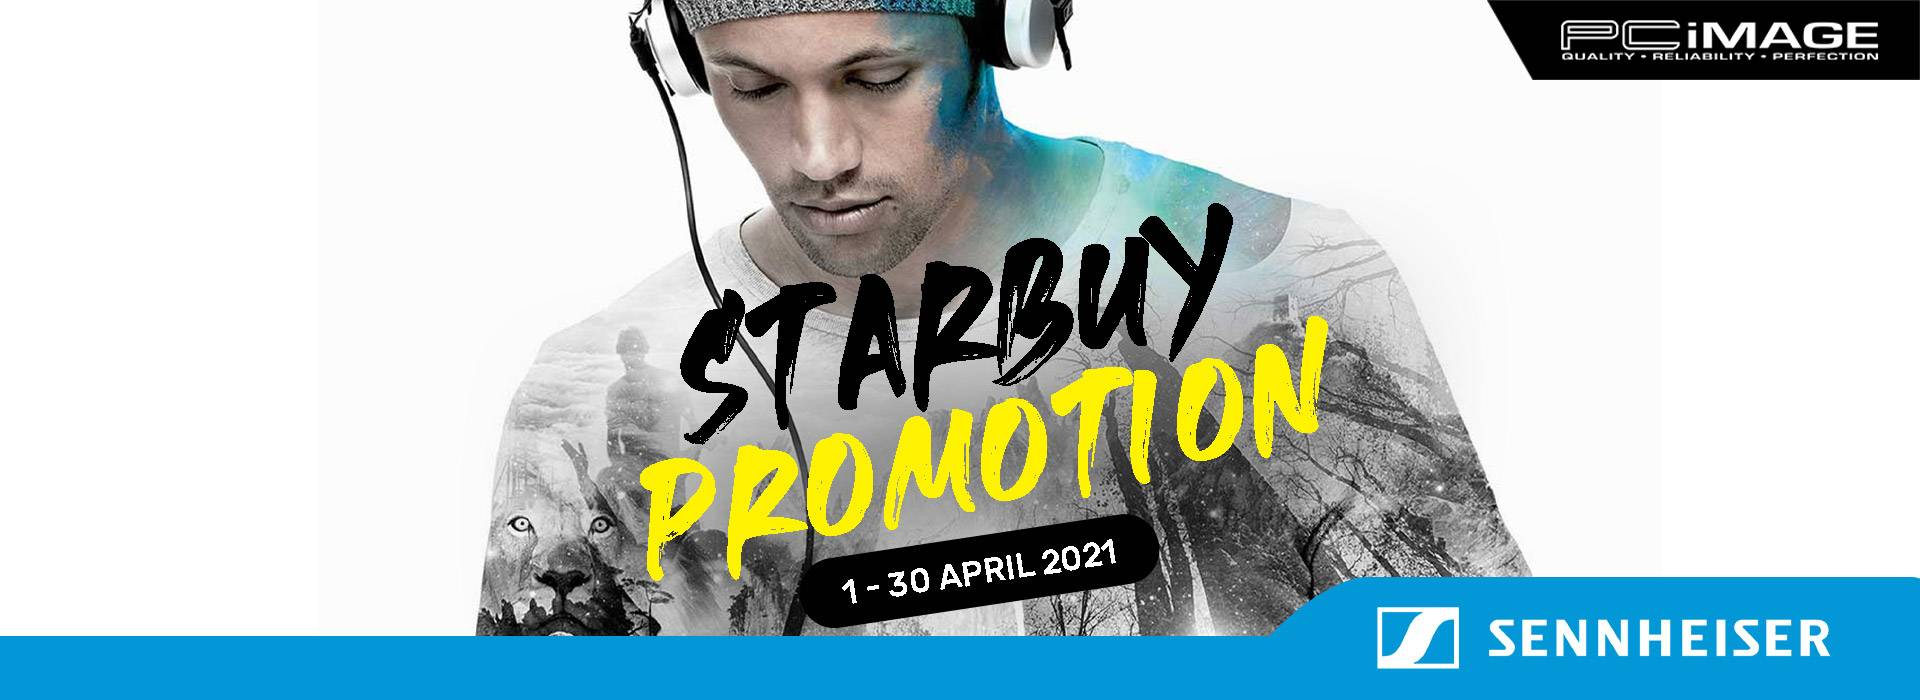 Sennheiser Starbuy Promotion 30 APR